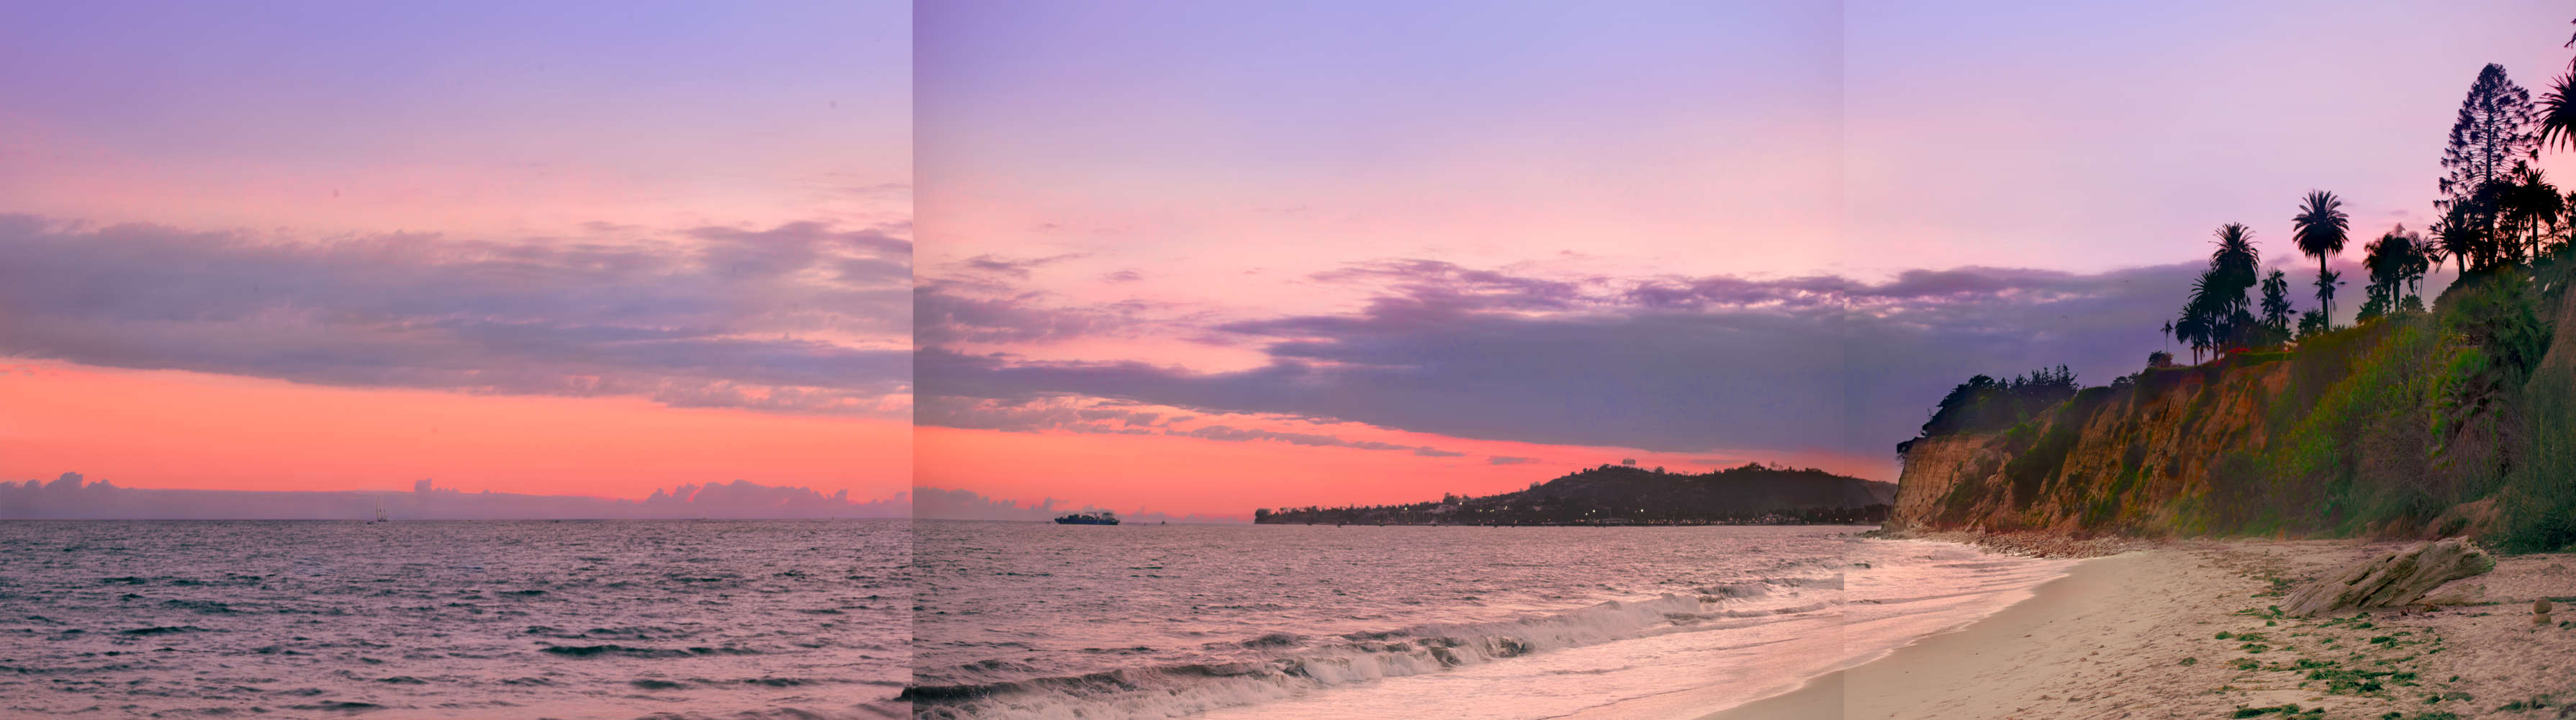 Montecito_Beach_Trip_10-10-18_Irregular_Crop-copy1000px